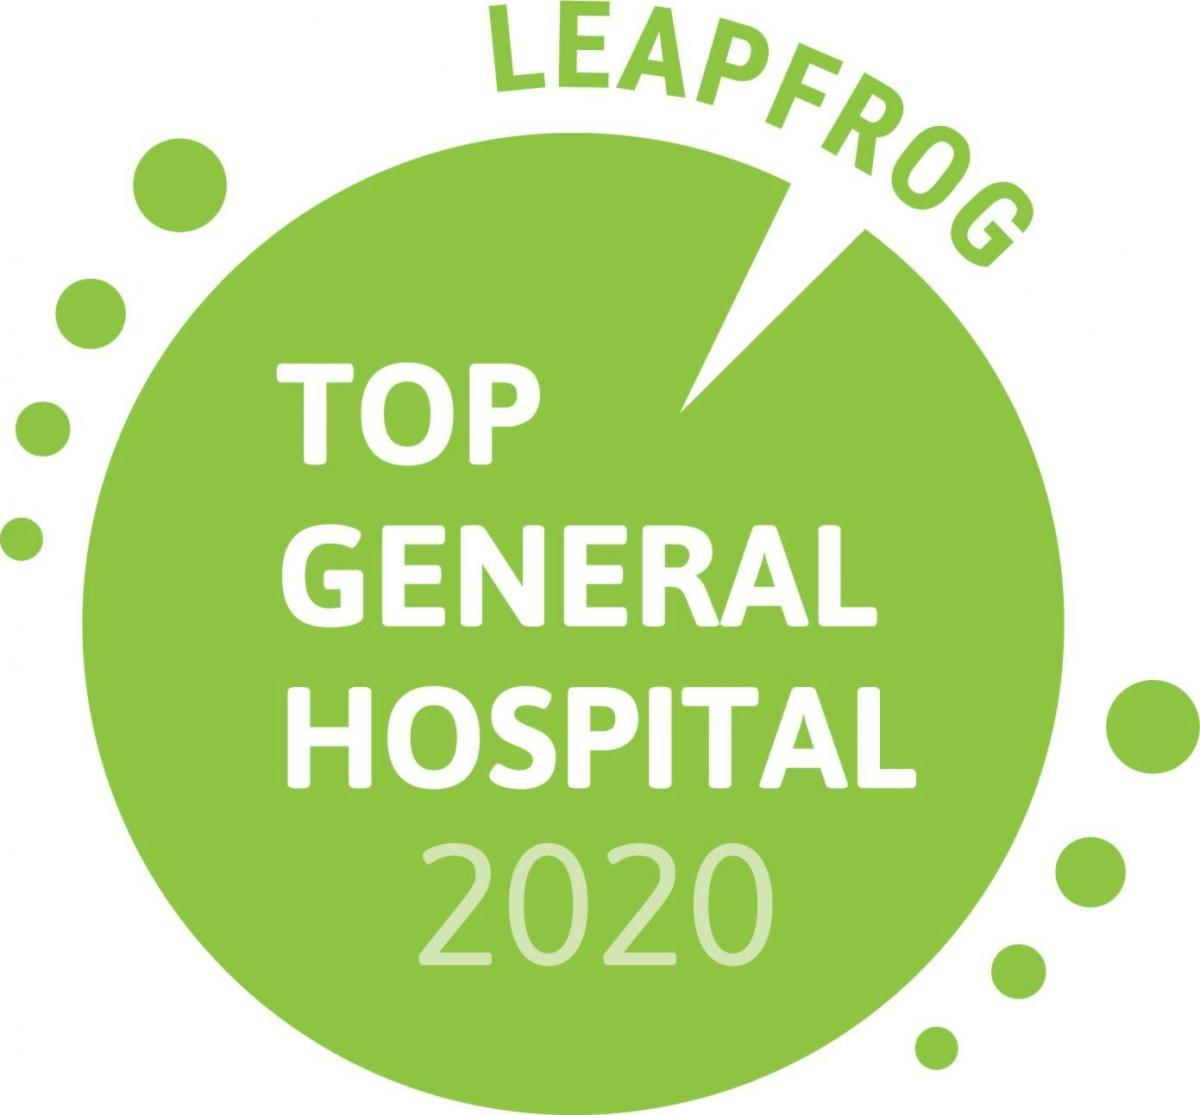 Hospital general superior de Leapfrog